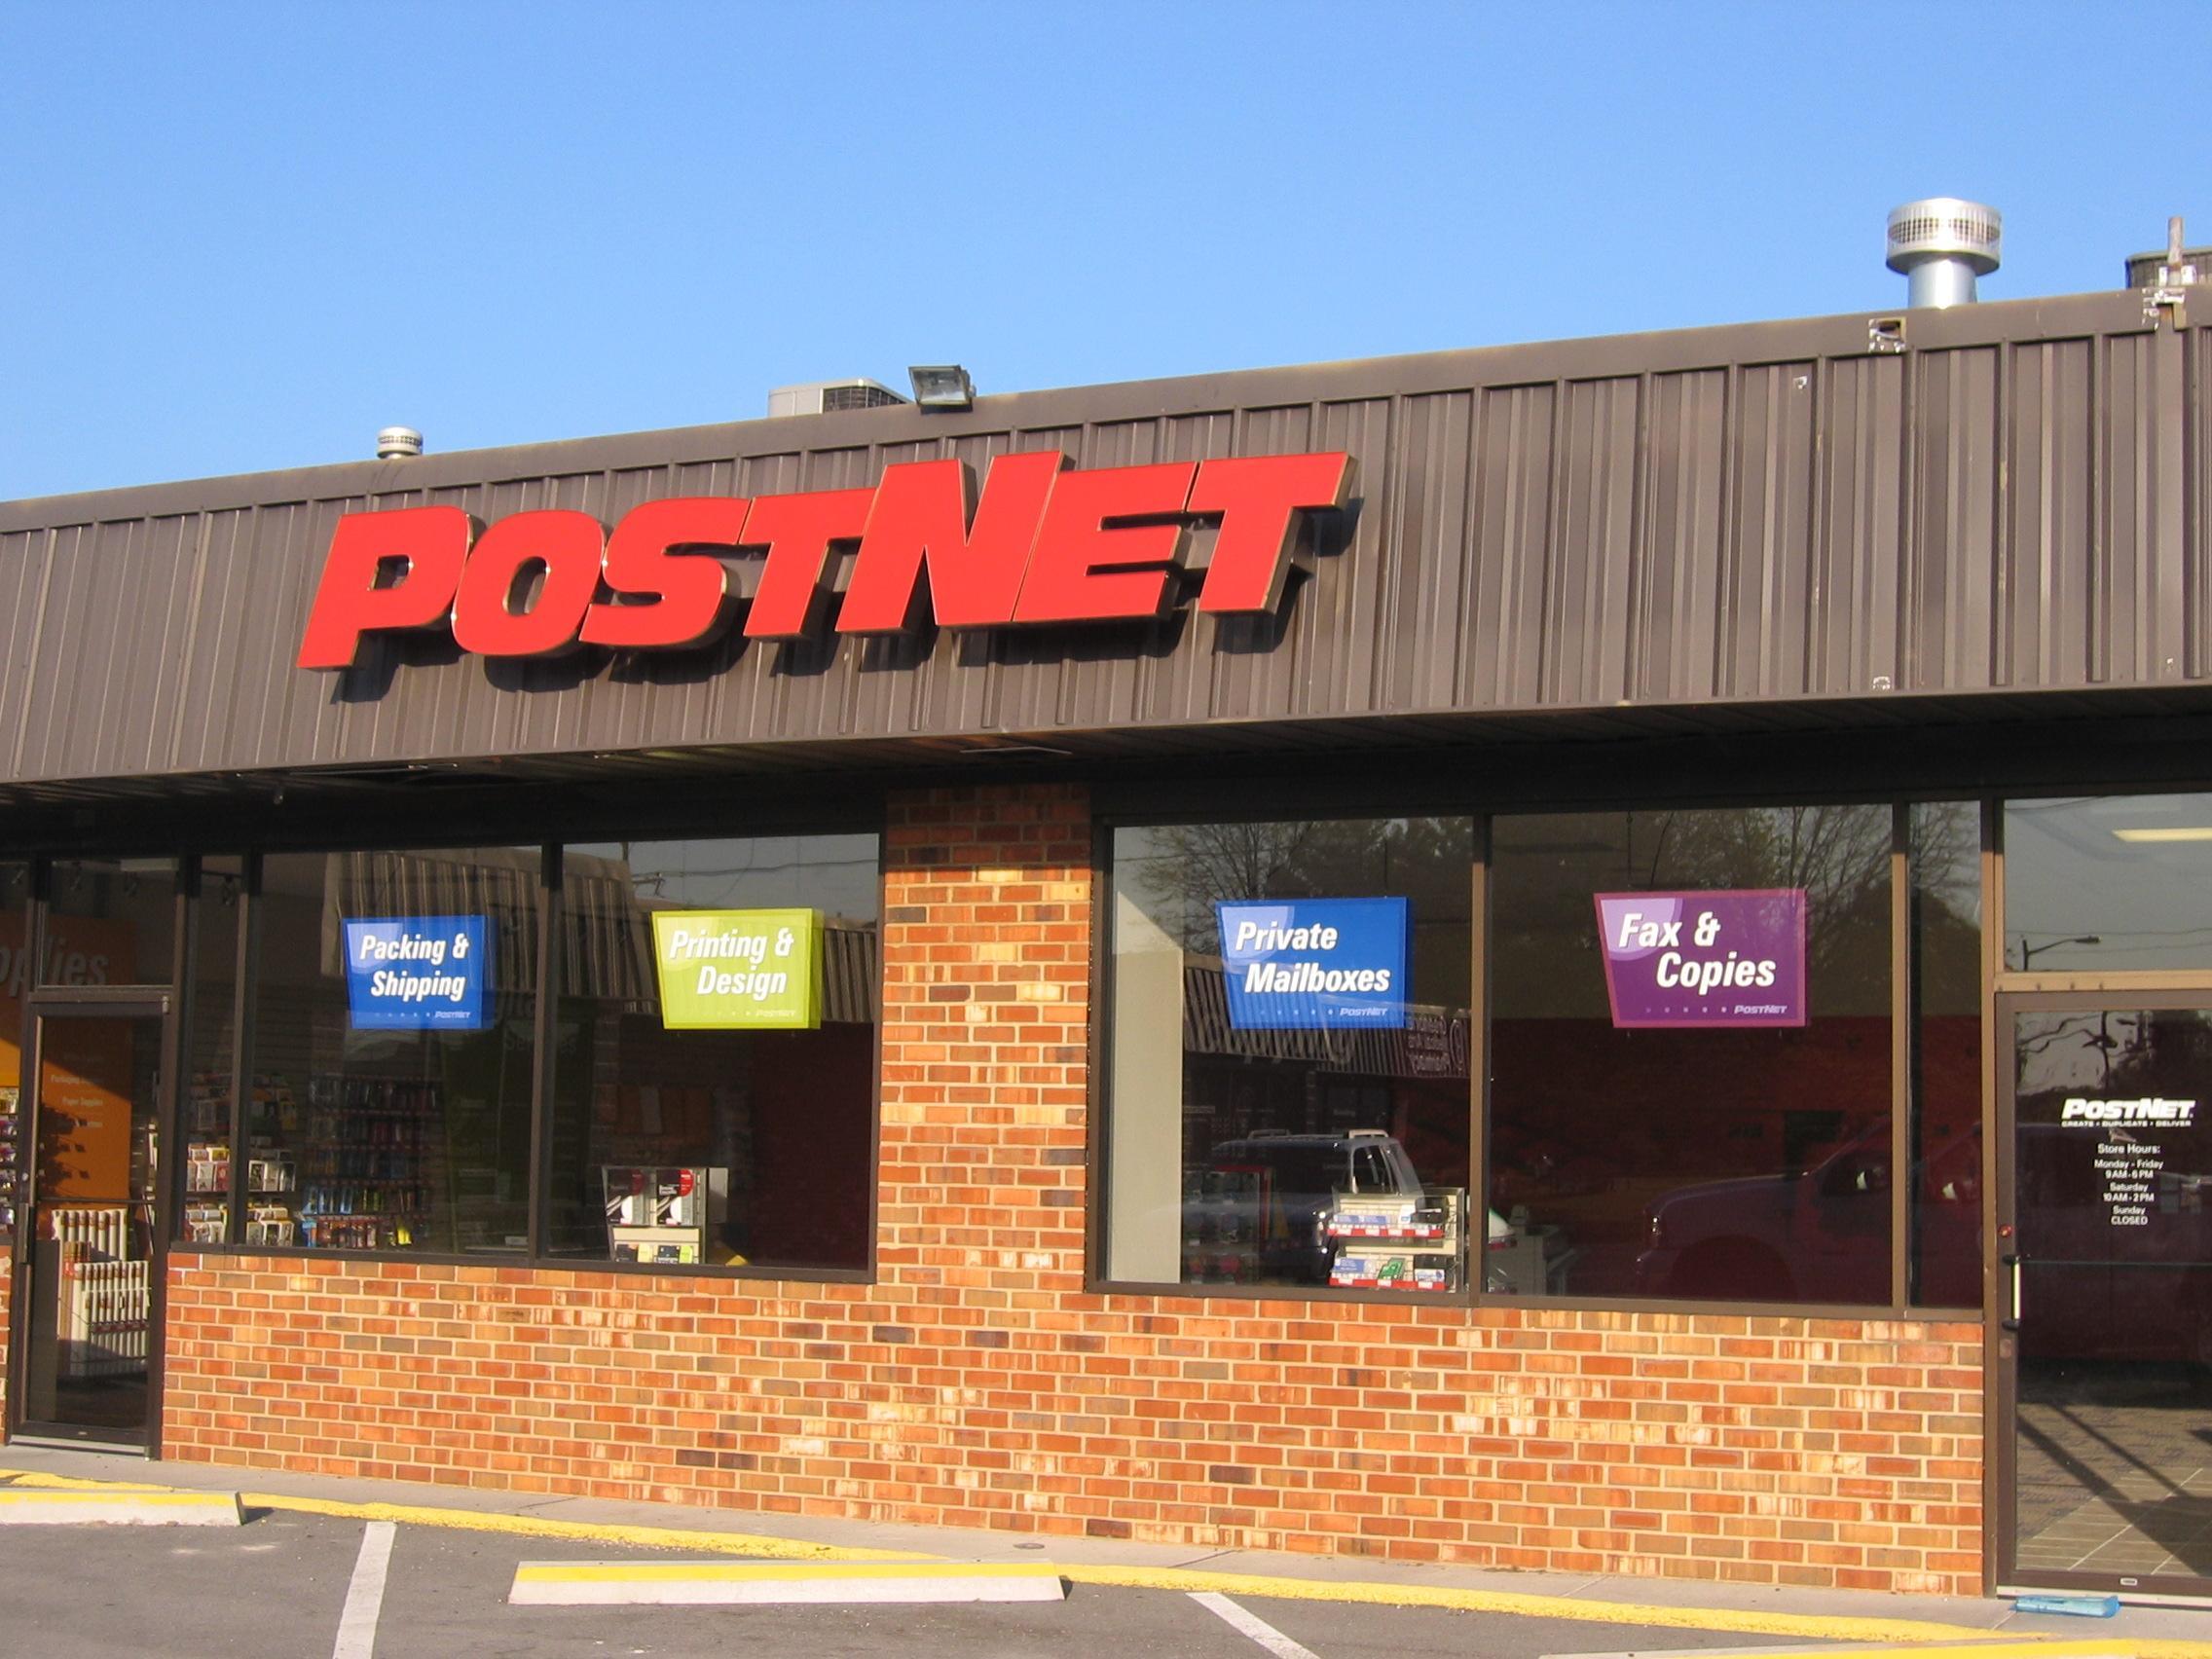 PostNet